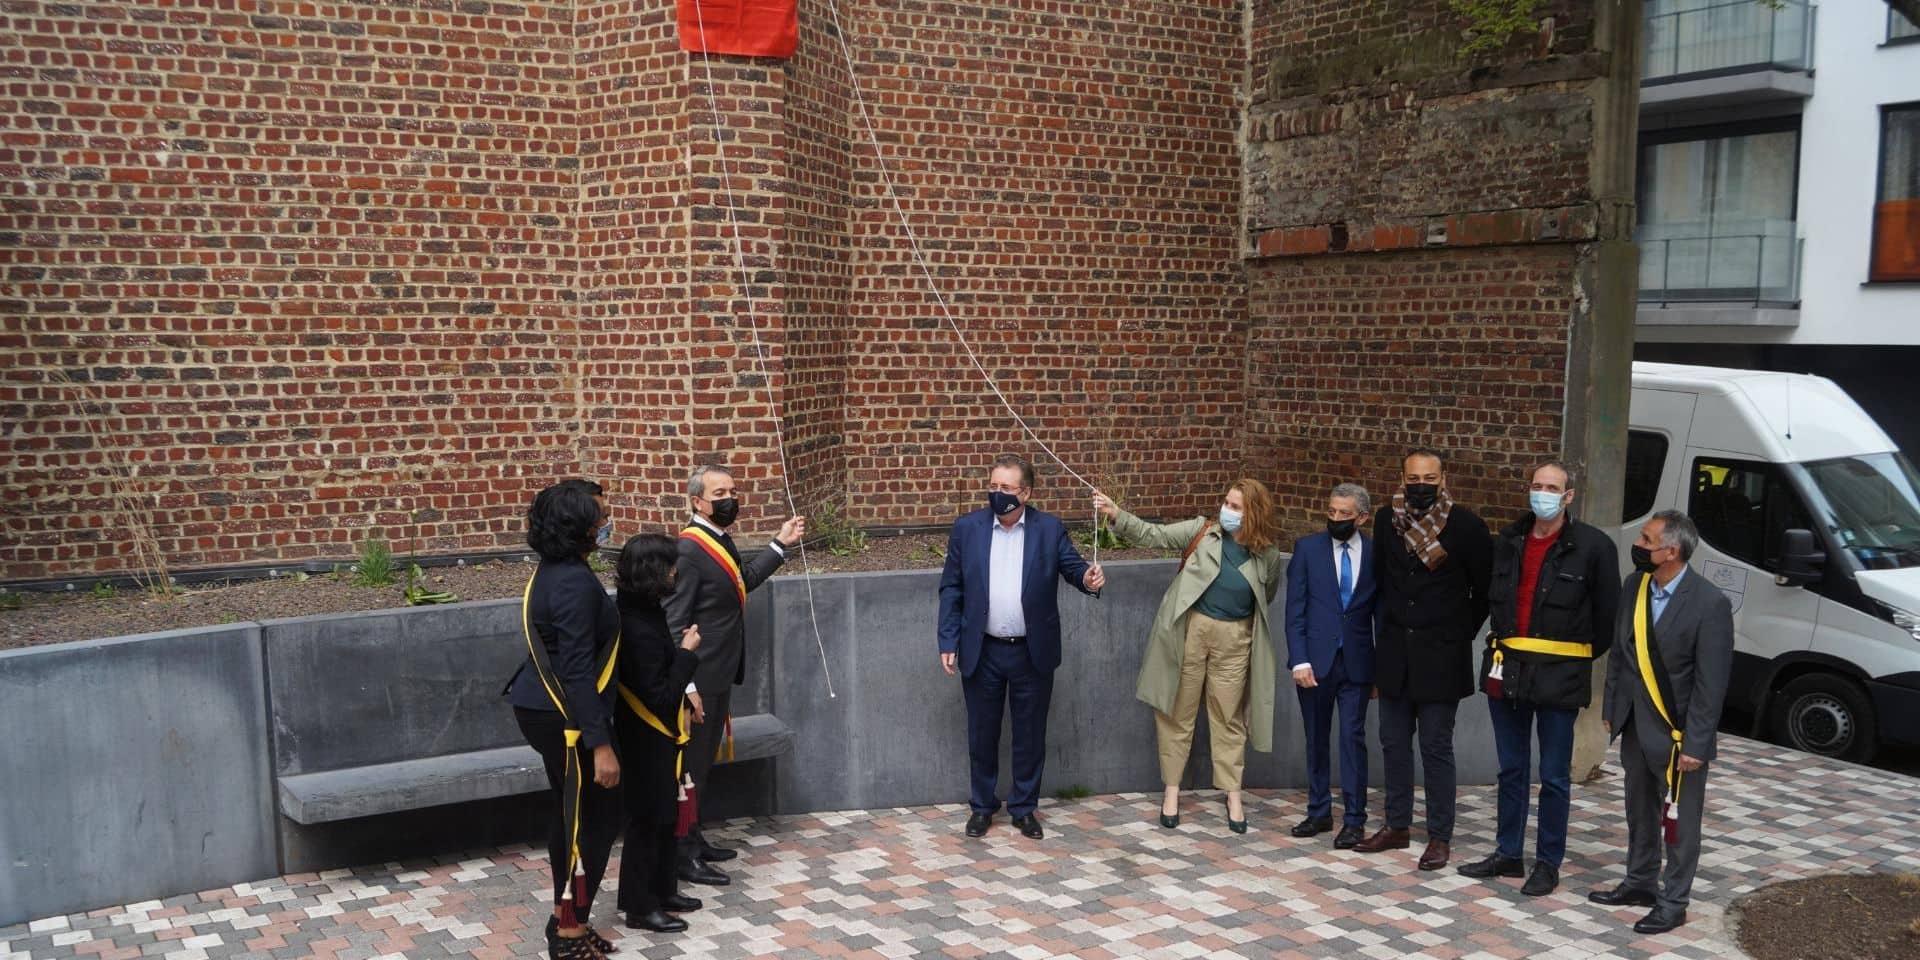 Saint-Josse : inauguration de la place Guy Cudell flambant neuve